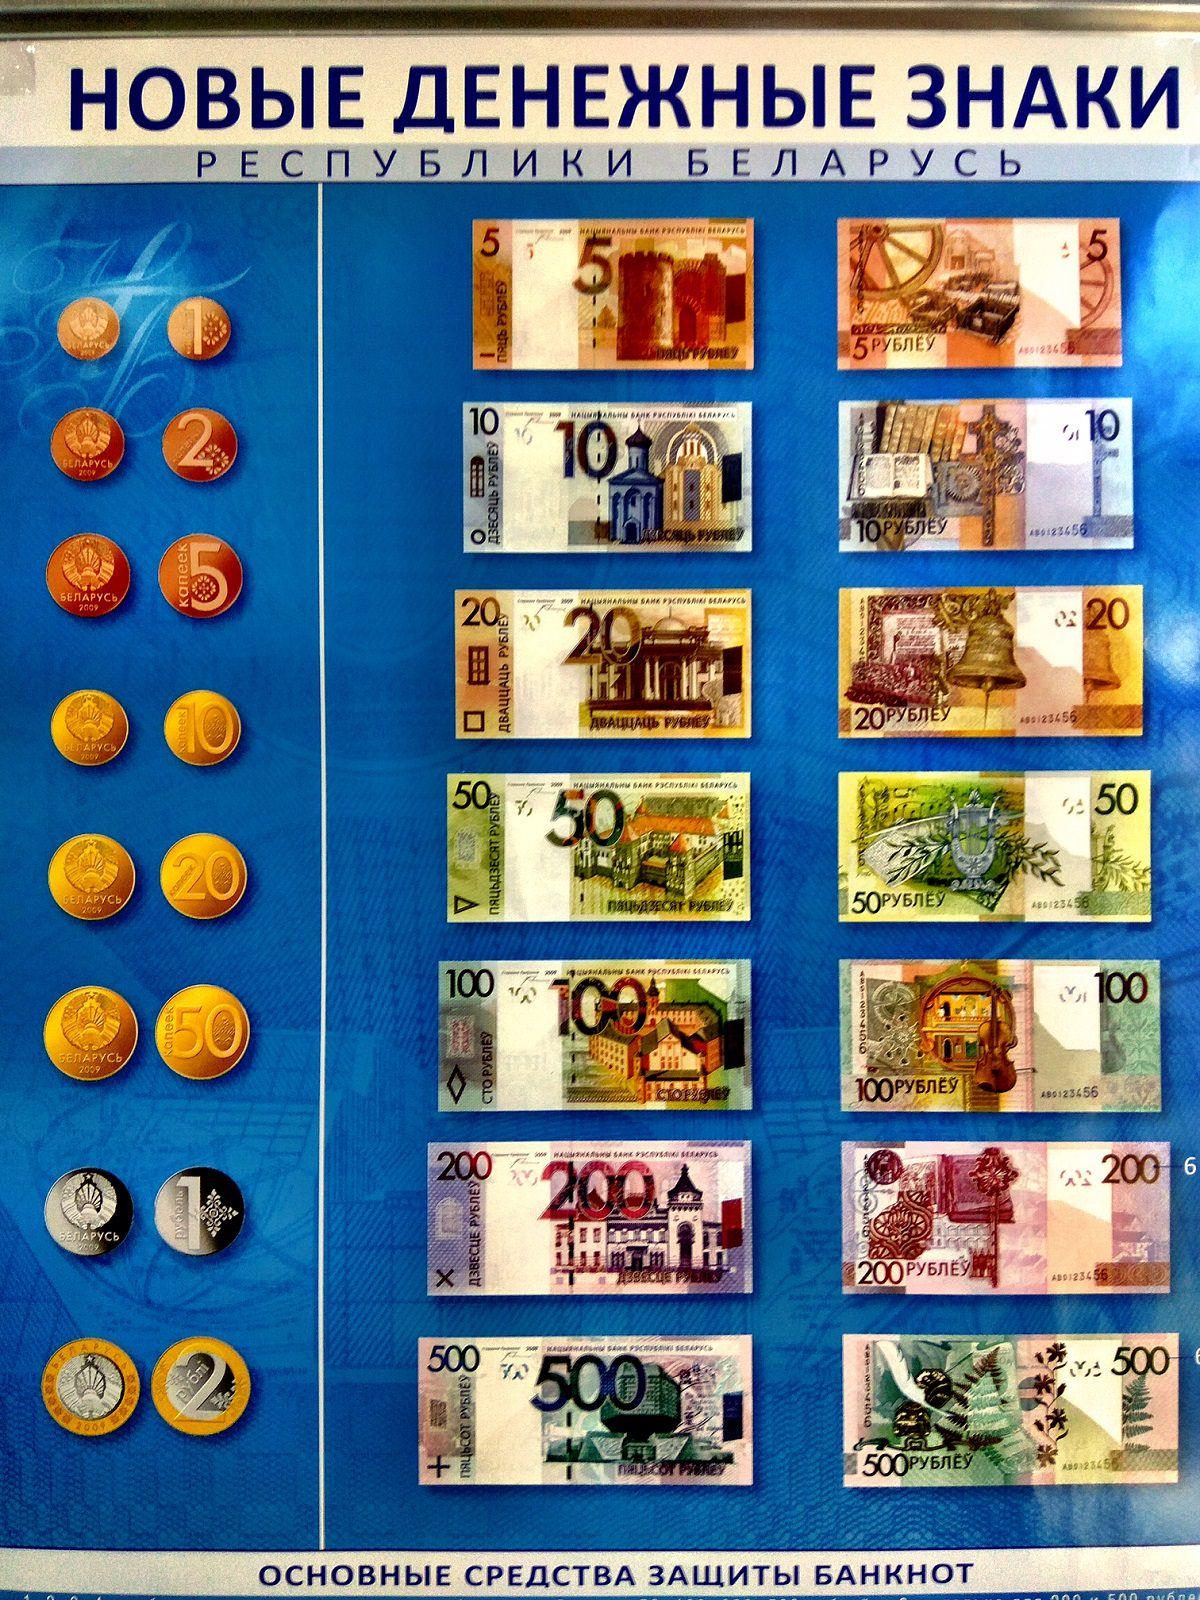 New currency in Belarus